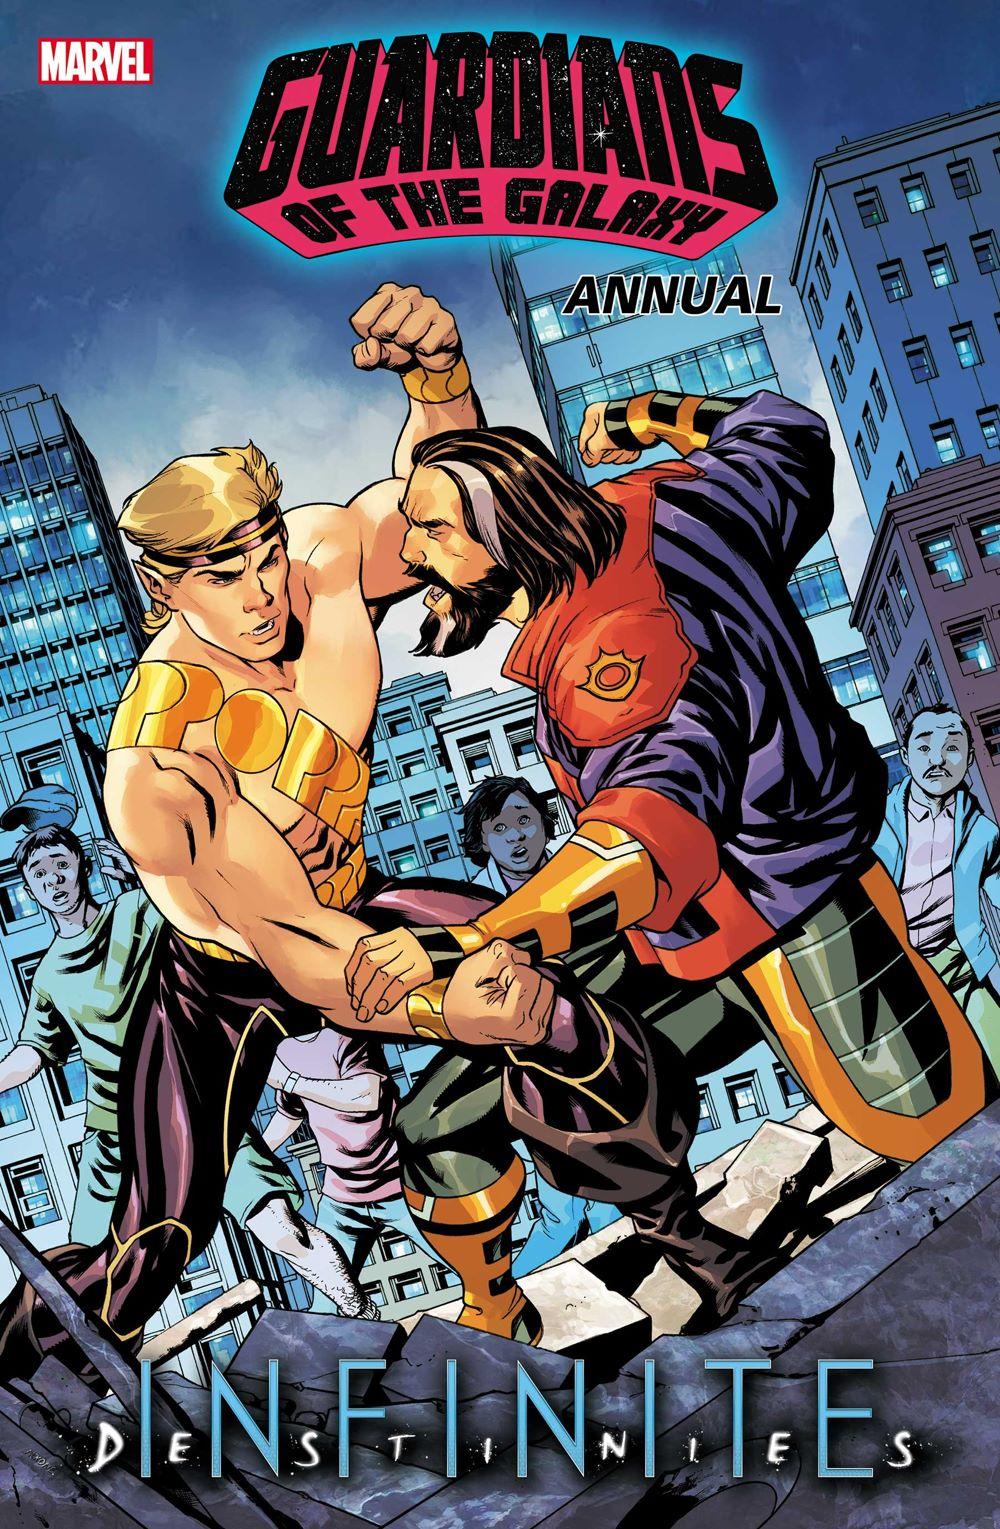 GARGALANN2021001_cov-1 Marvel Comics August 2021 Solicitations